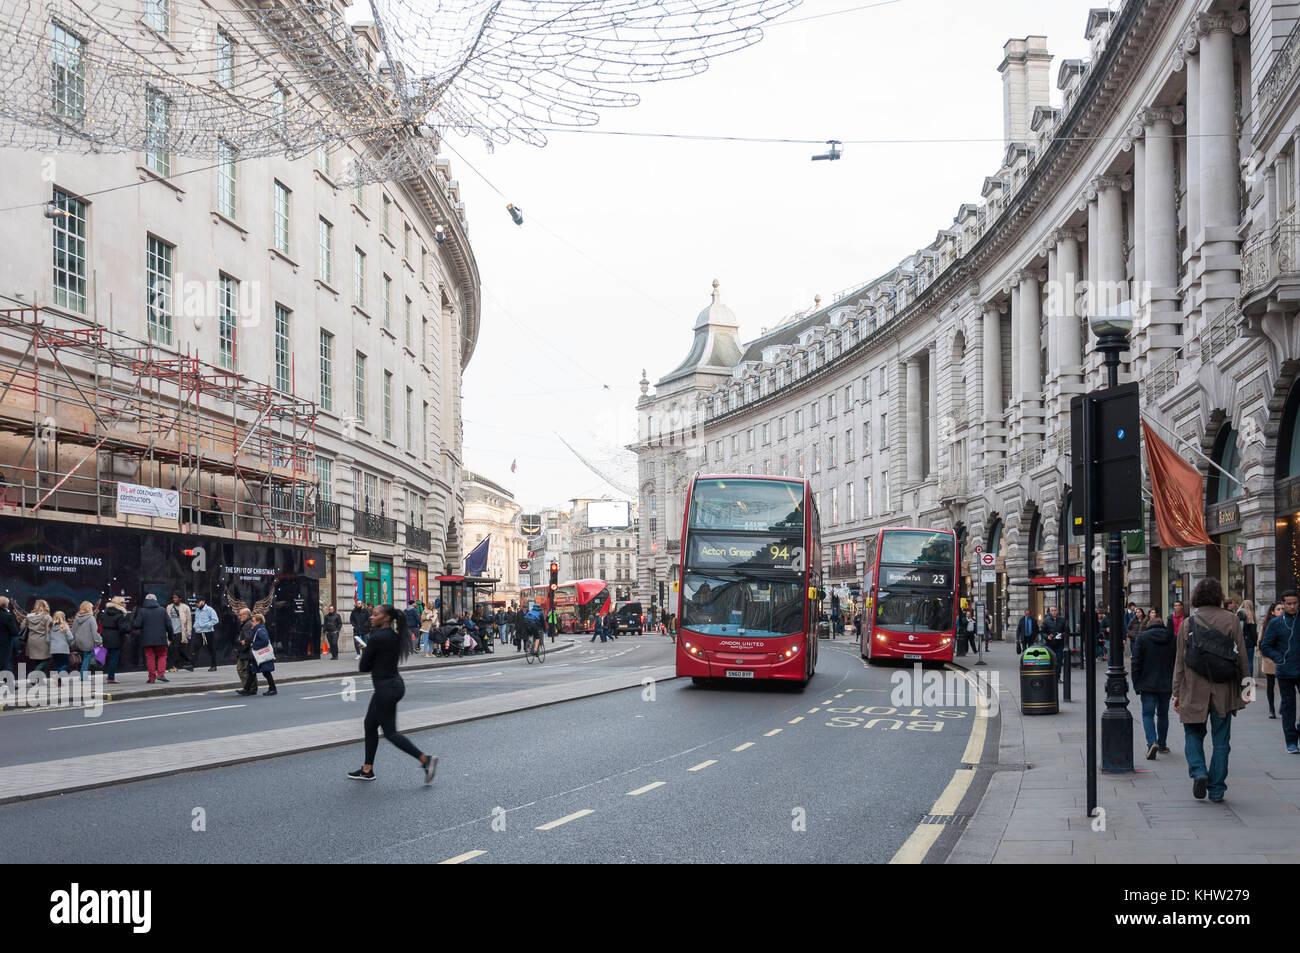 Regent Street, Soho, City of Westminster, Greater London, England, United Kingdom - Stock Image